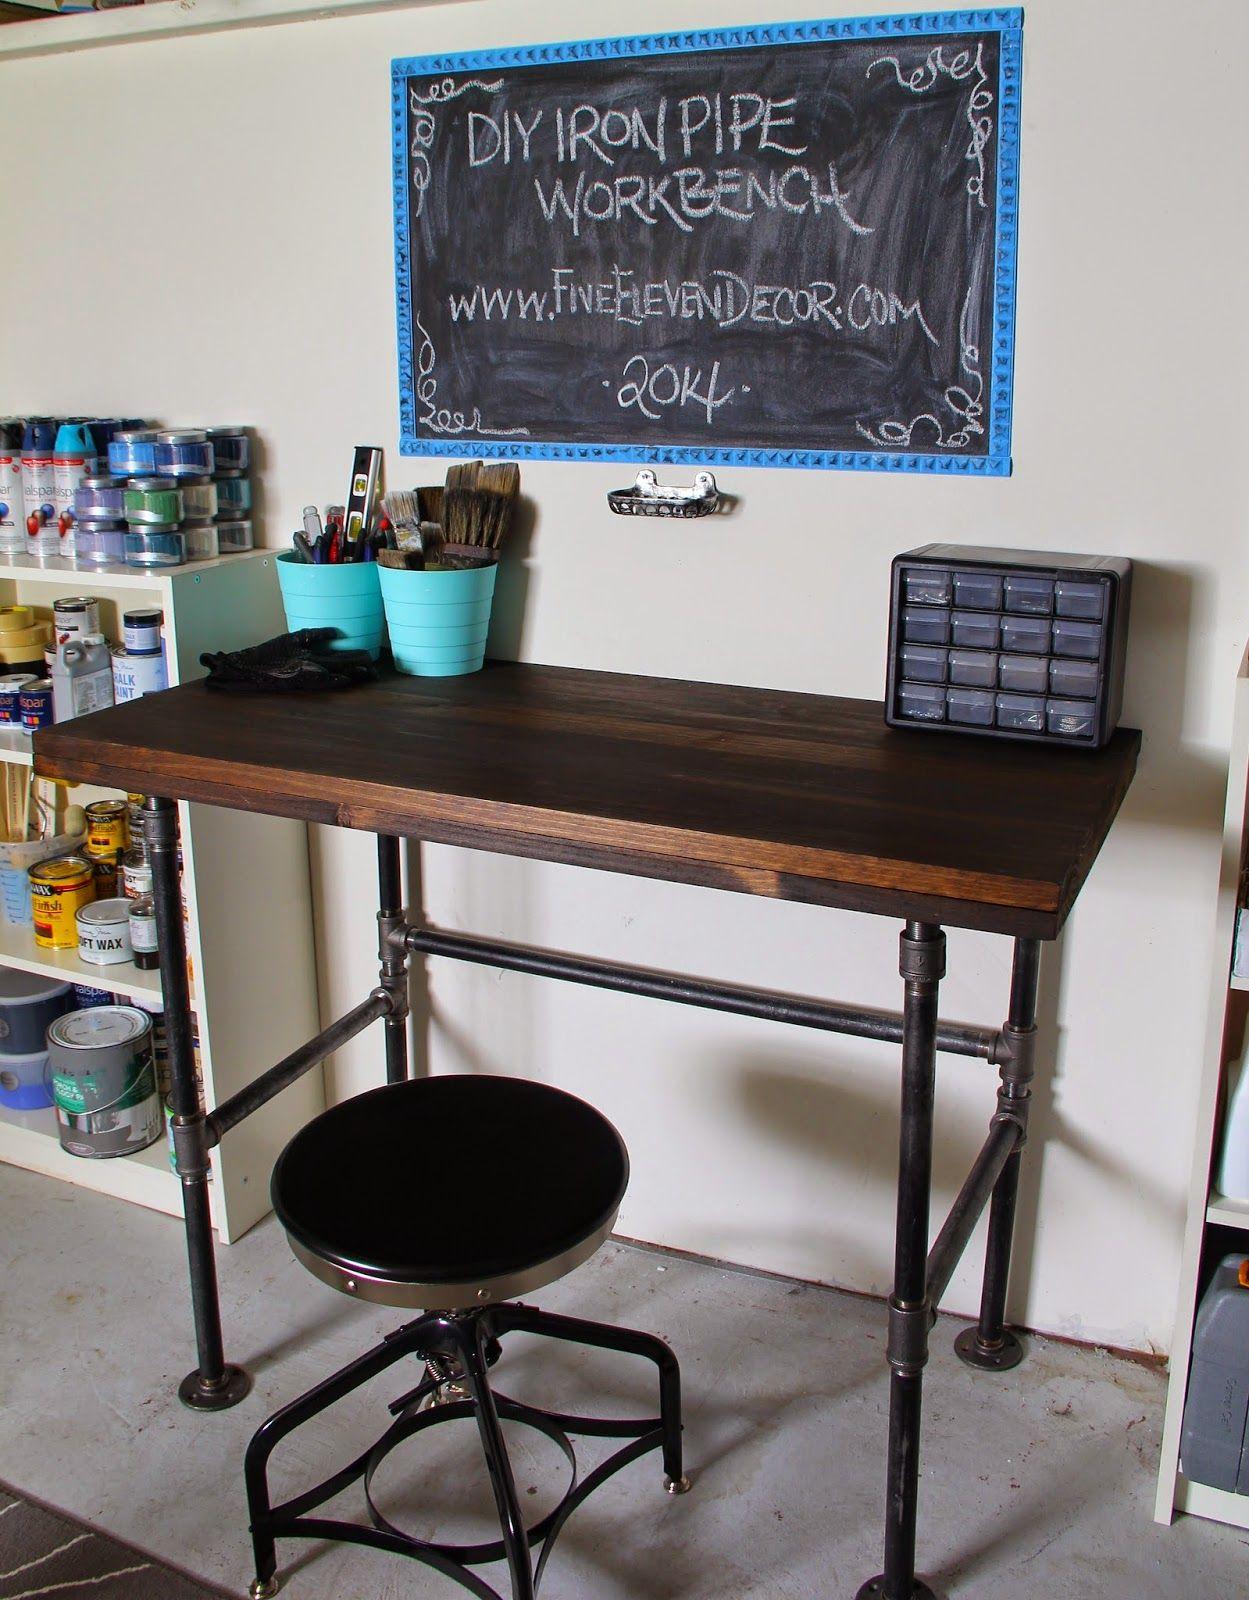 Fiveelevendecor diy black iron pipe workbench for Plumbing pipe desk plans